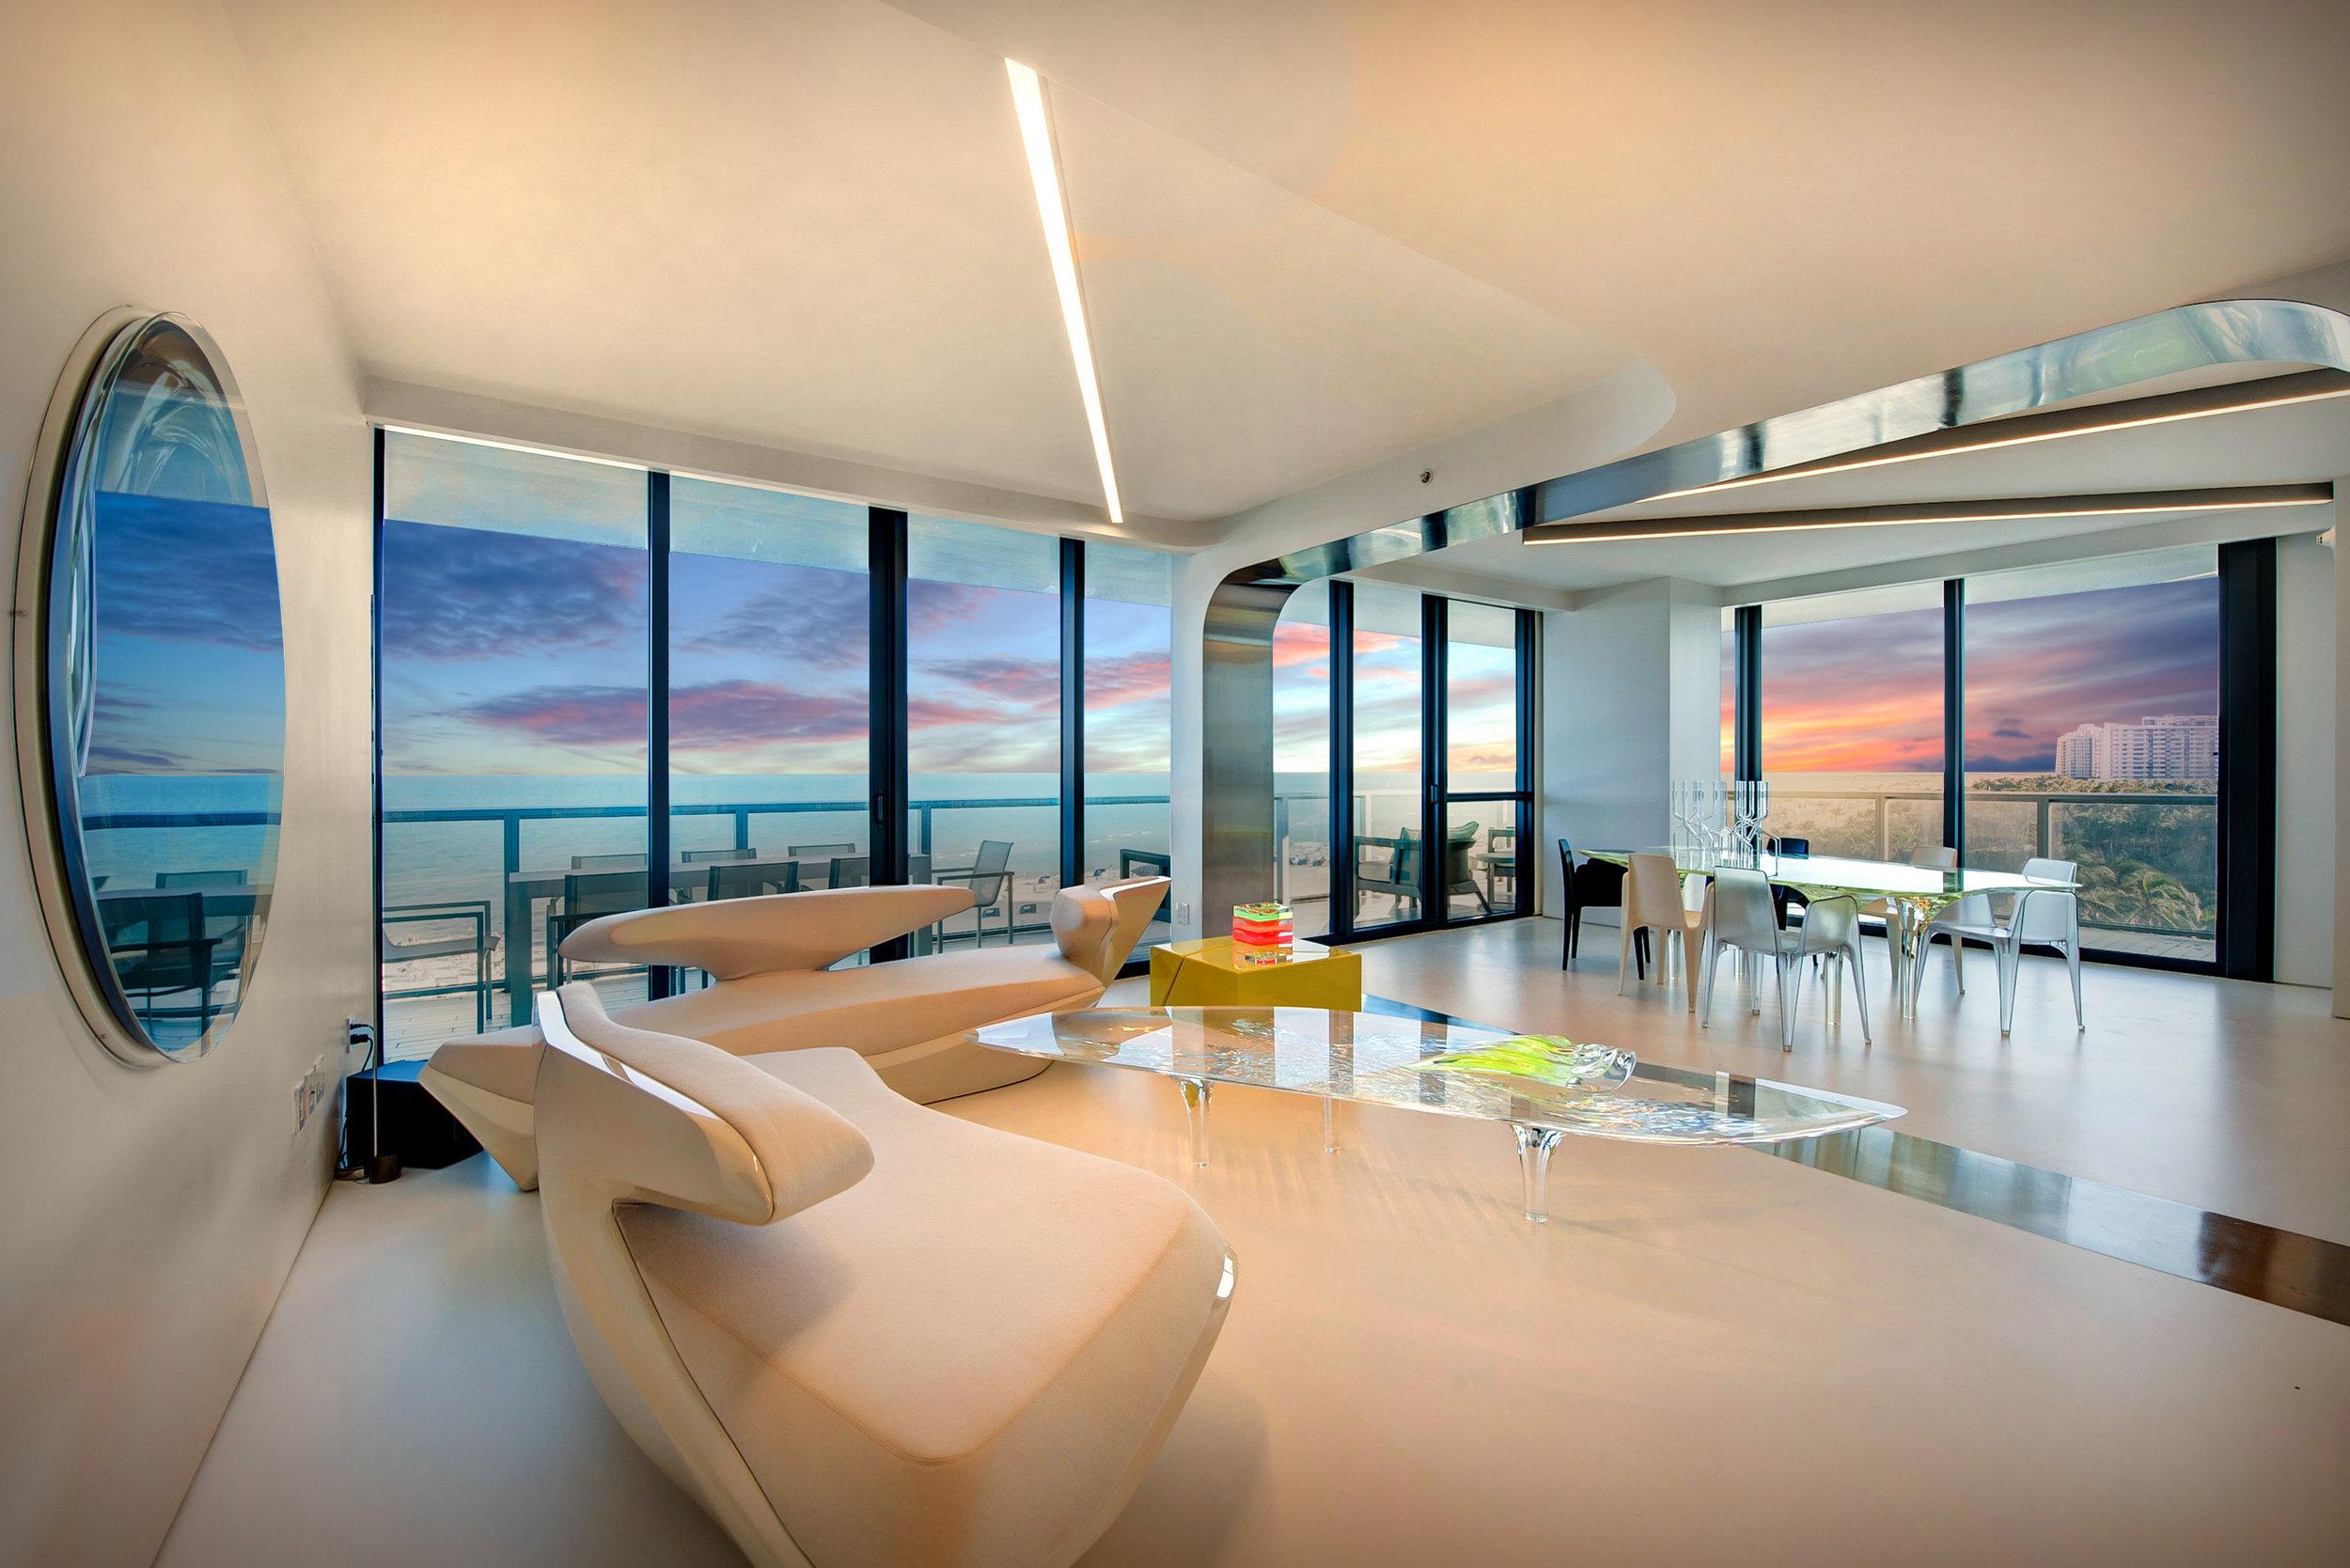 Pritzker-Prize Winning Architect Zaha Hadid's Personal W South Beach Condo Sells For $5.75 Million